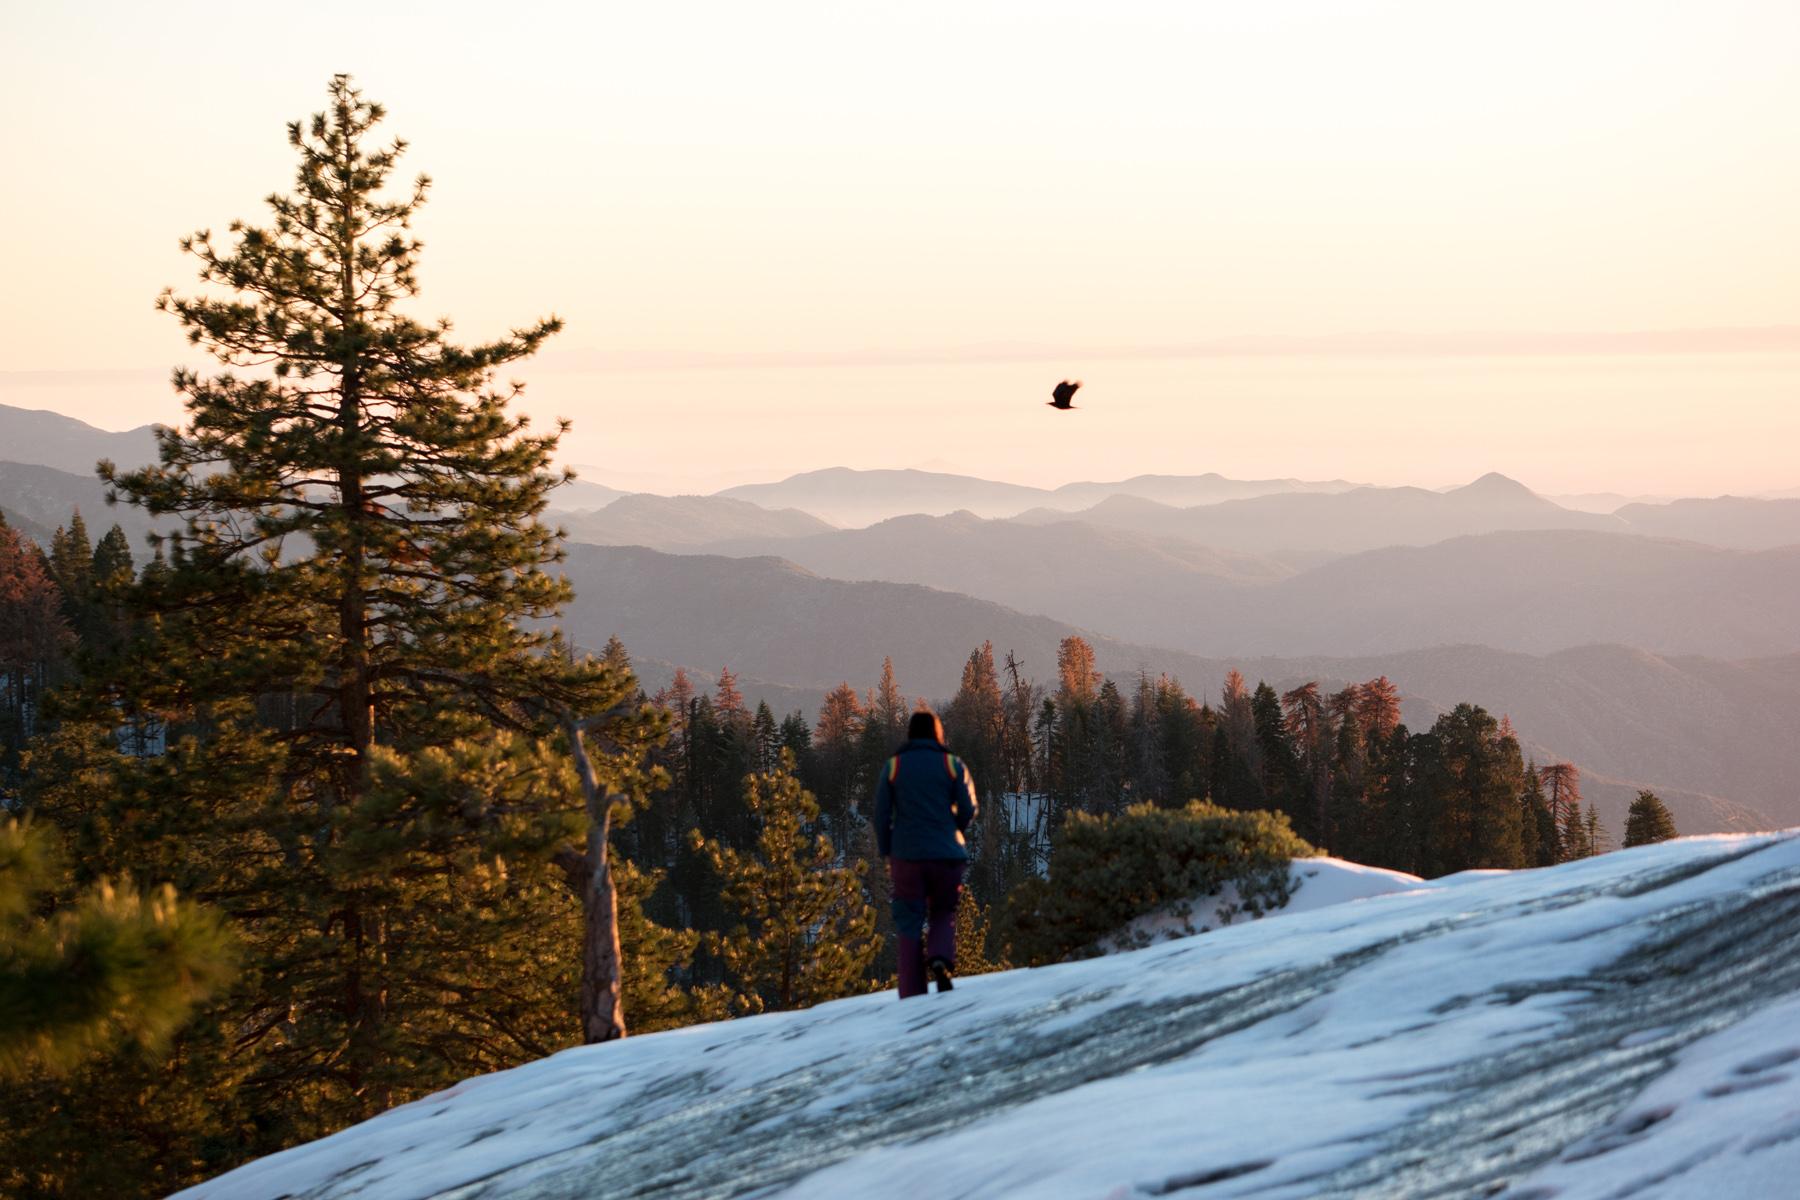 Wasim Muklashy Photography_Sequoia National Park_California_December 2015_-SAM_4163.jpg